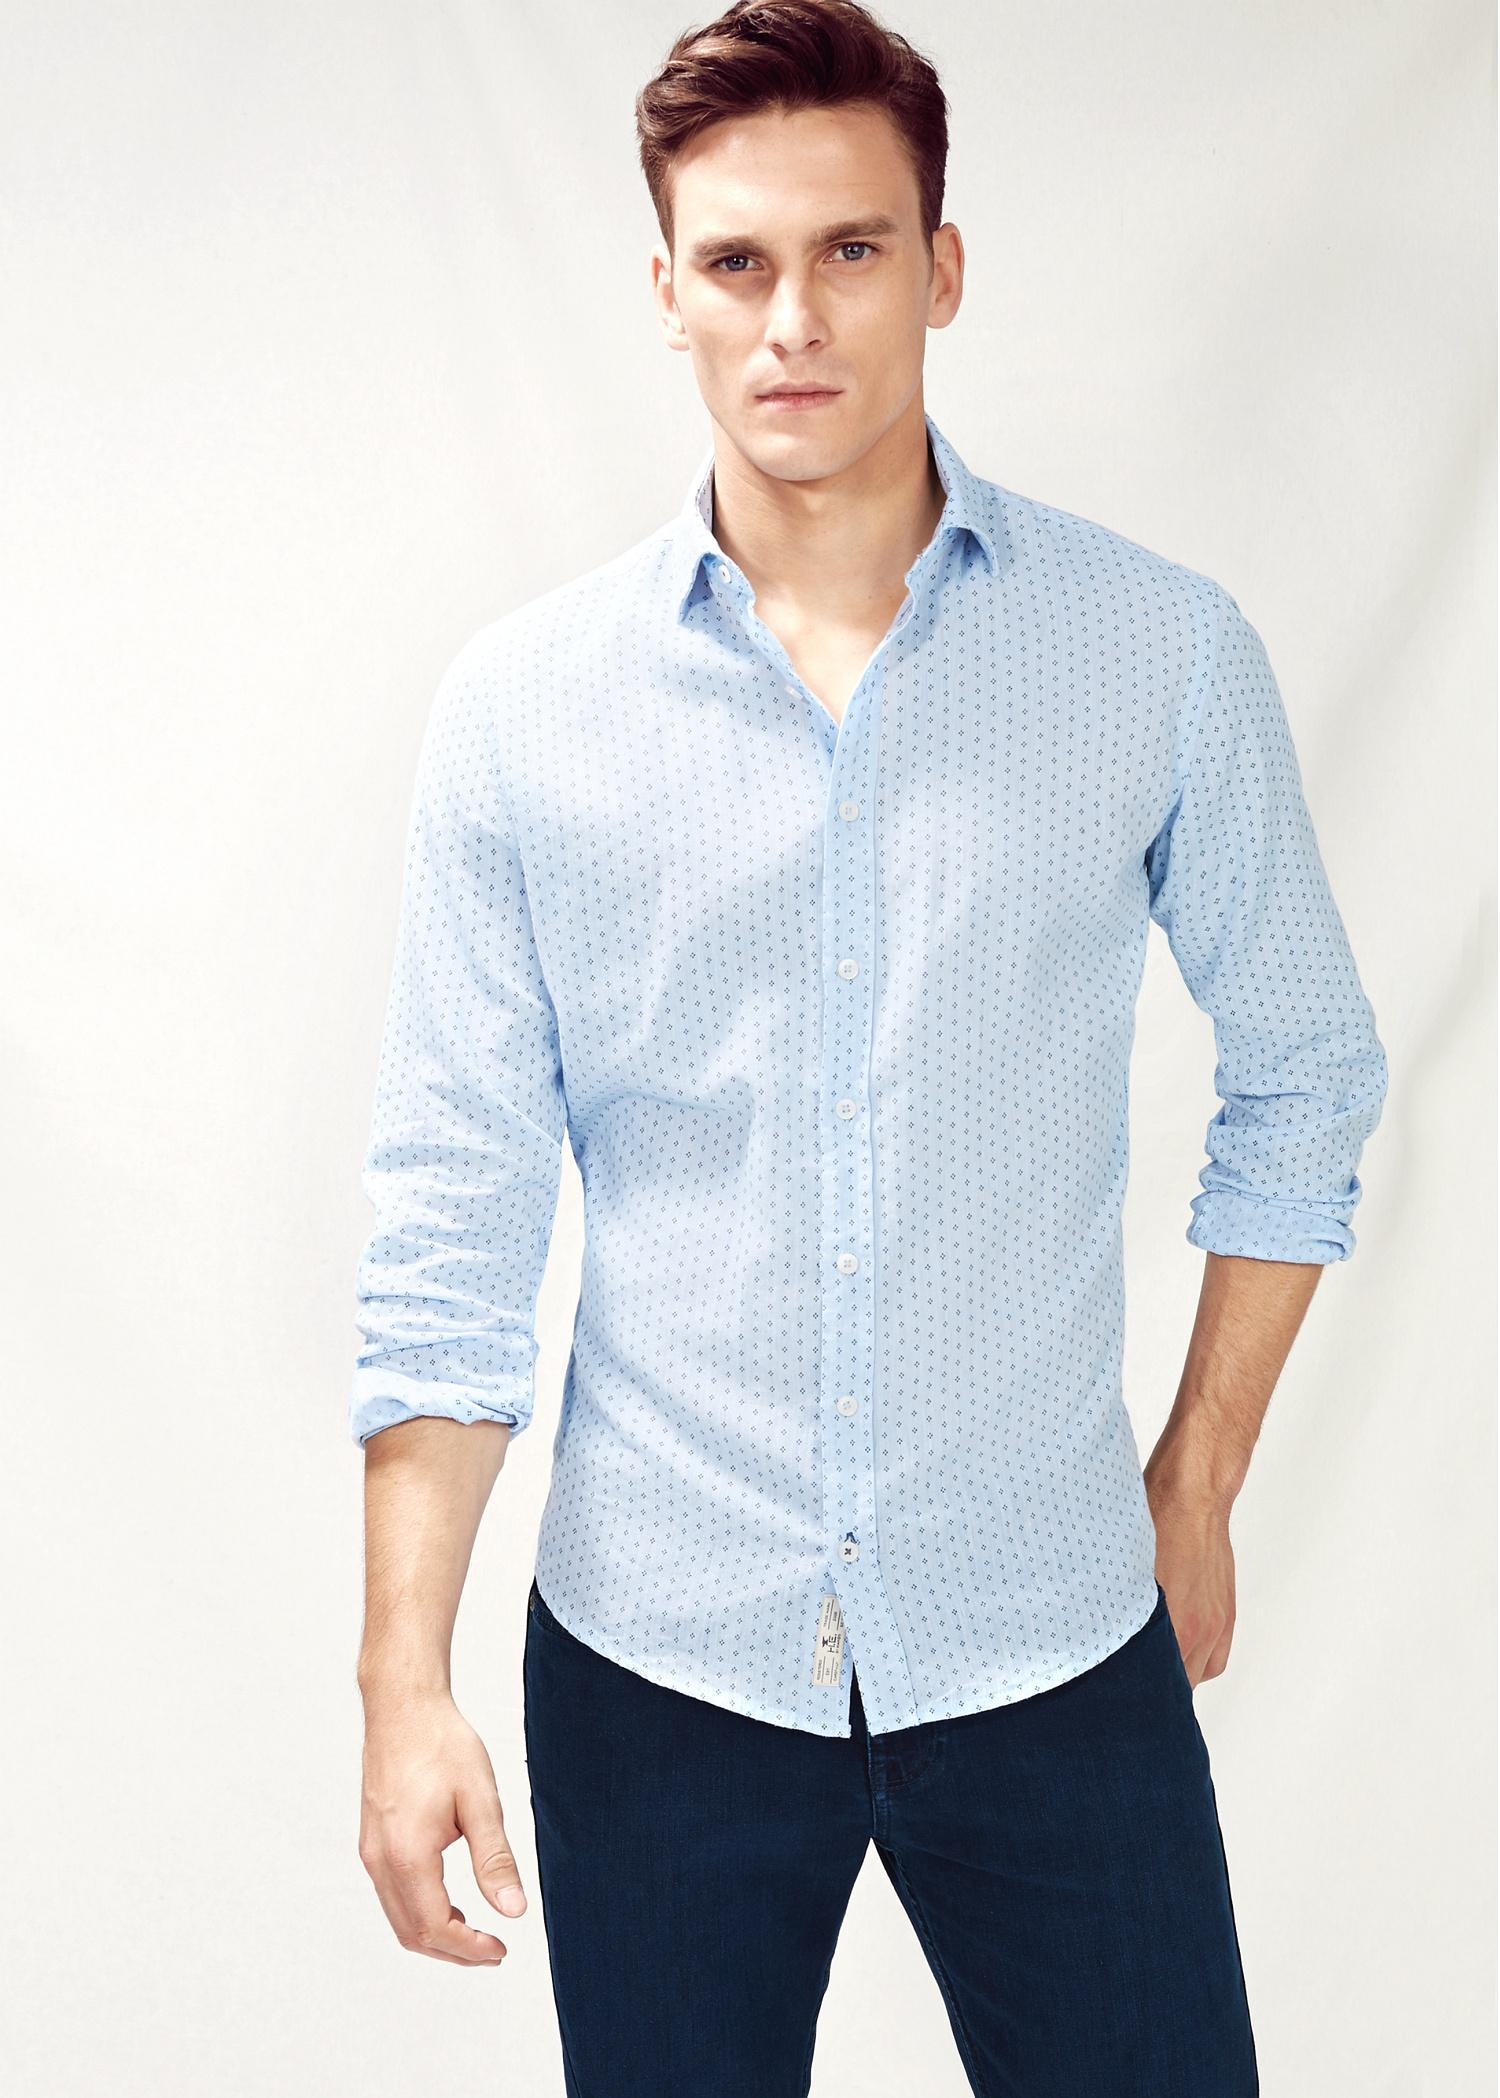 d15f1a5ea9f Mango Slim-Fit Tie Print Linen-Blend Shirt in Blue for Men - Lyst